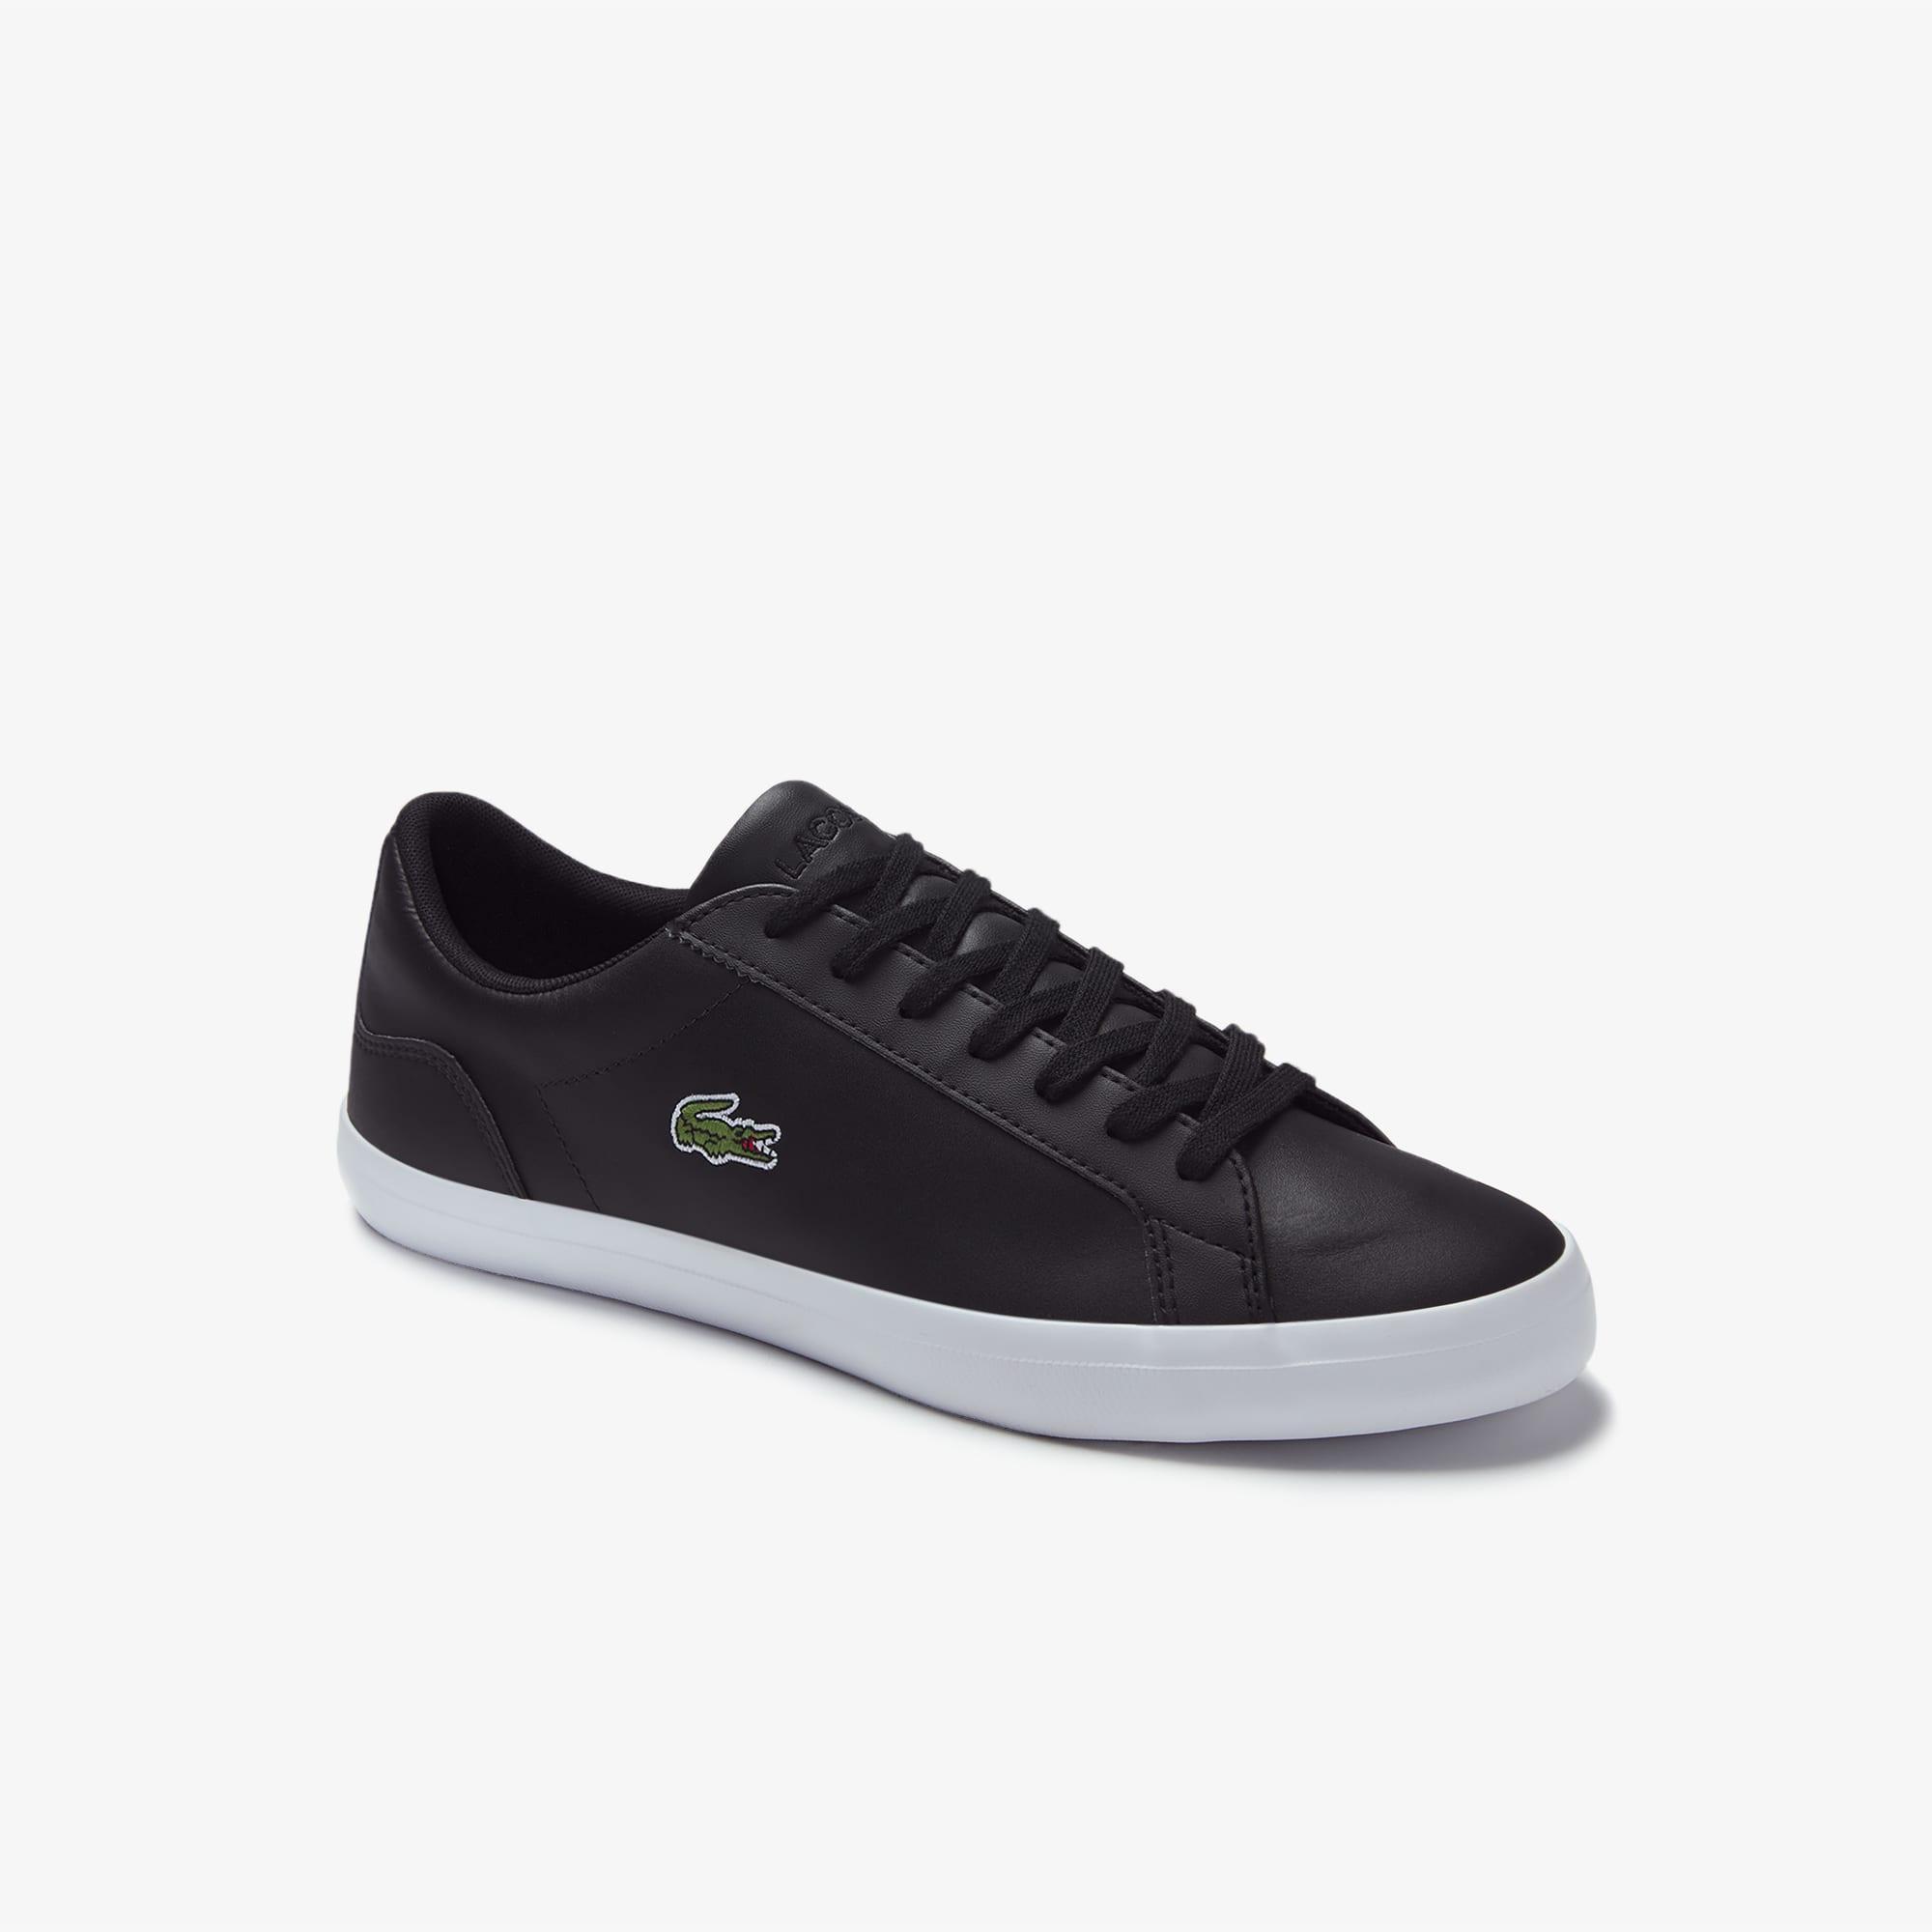 Sneakers Lerond in pelle monocolore